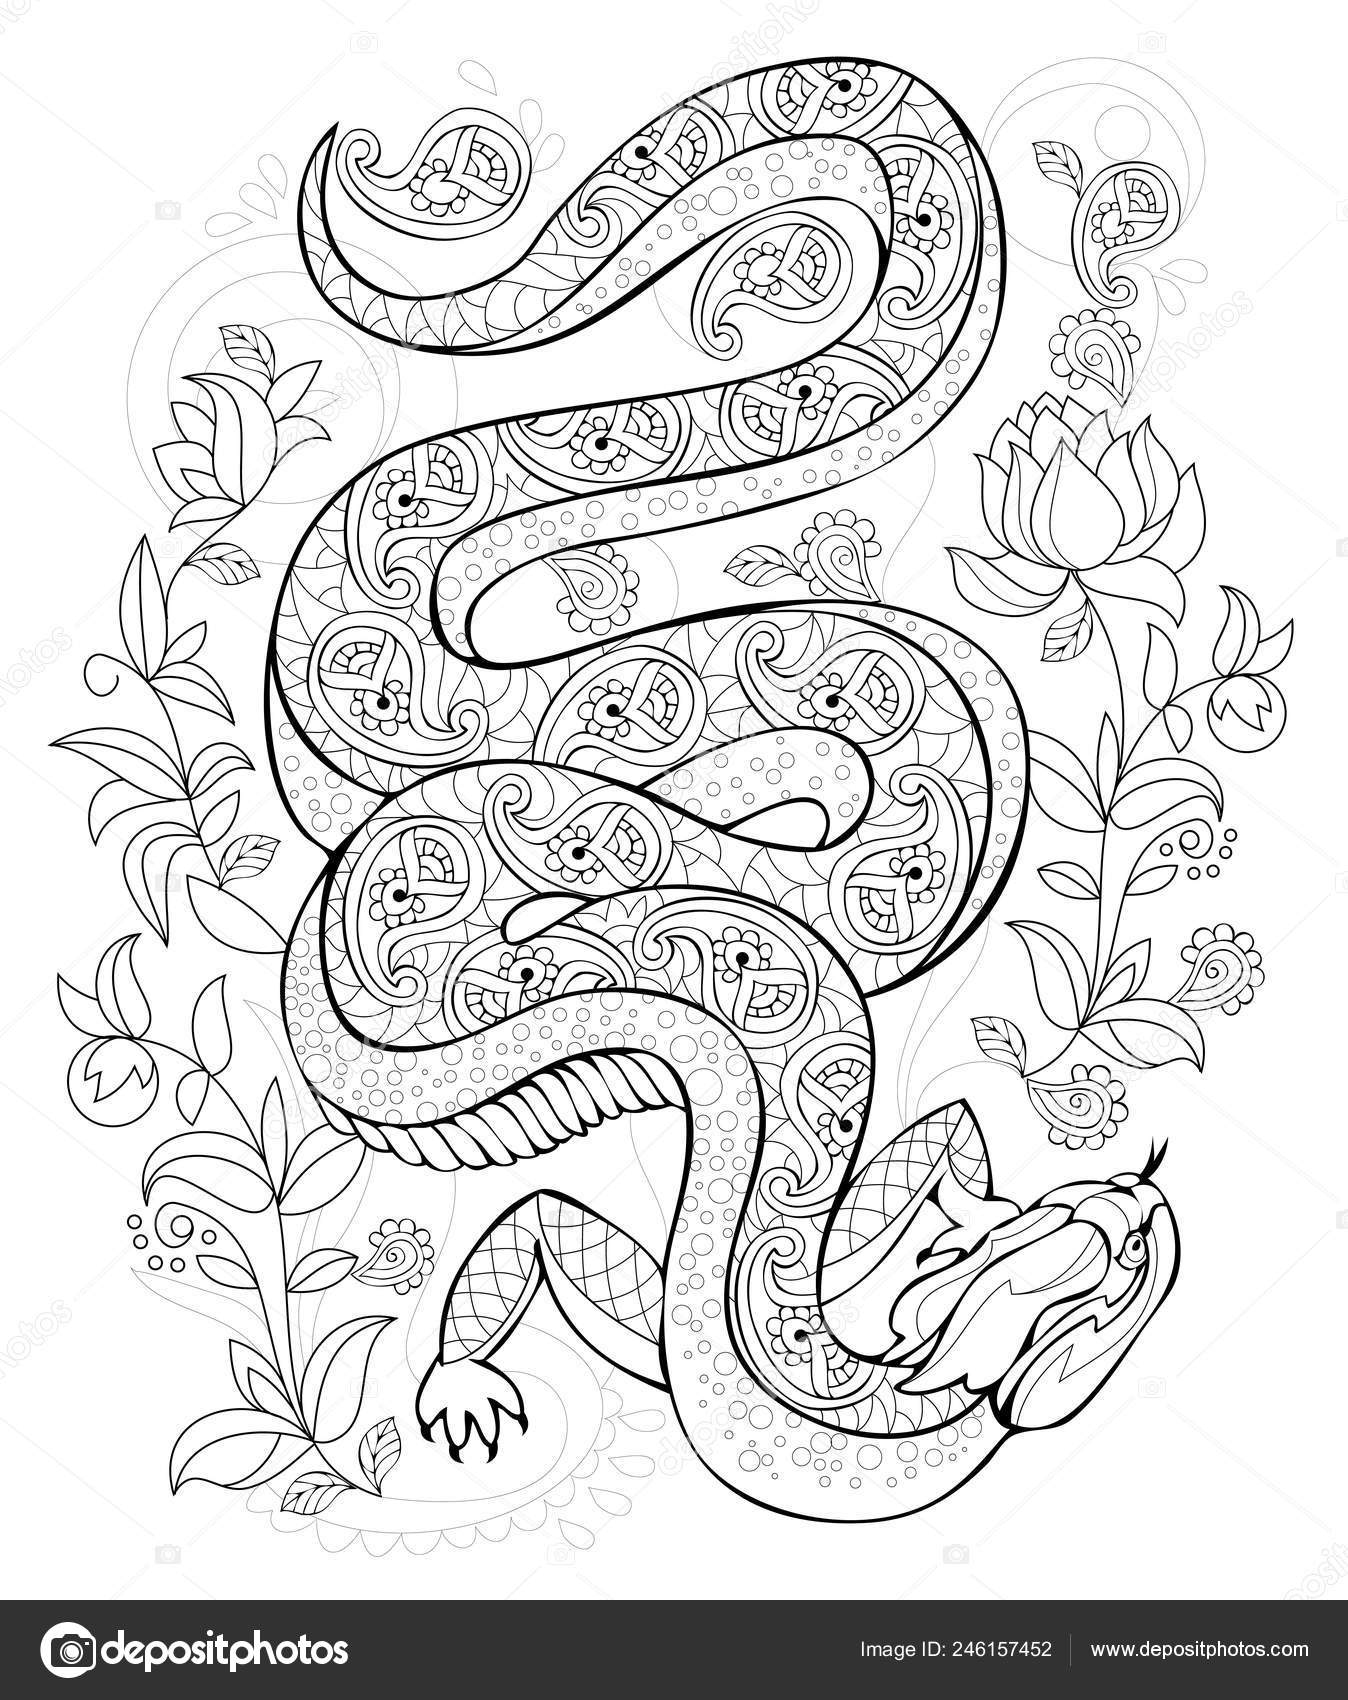 depositphotos stock illustration stylized lizard jungle black white